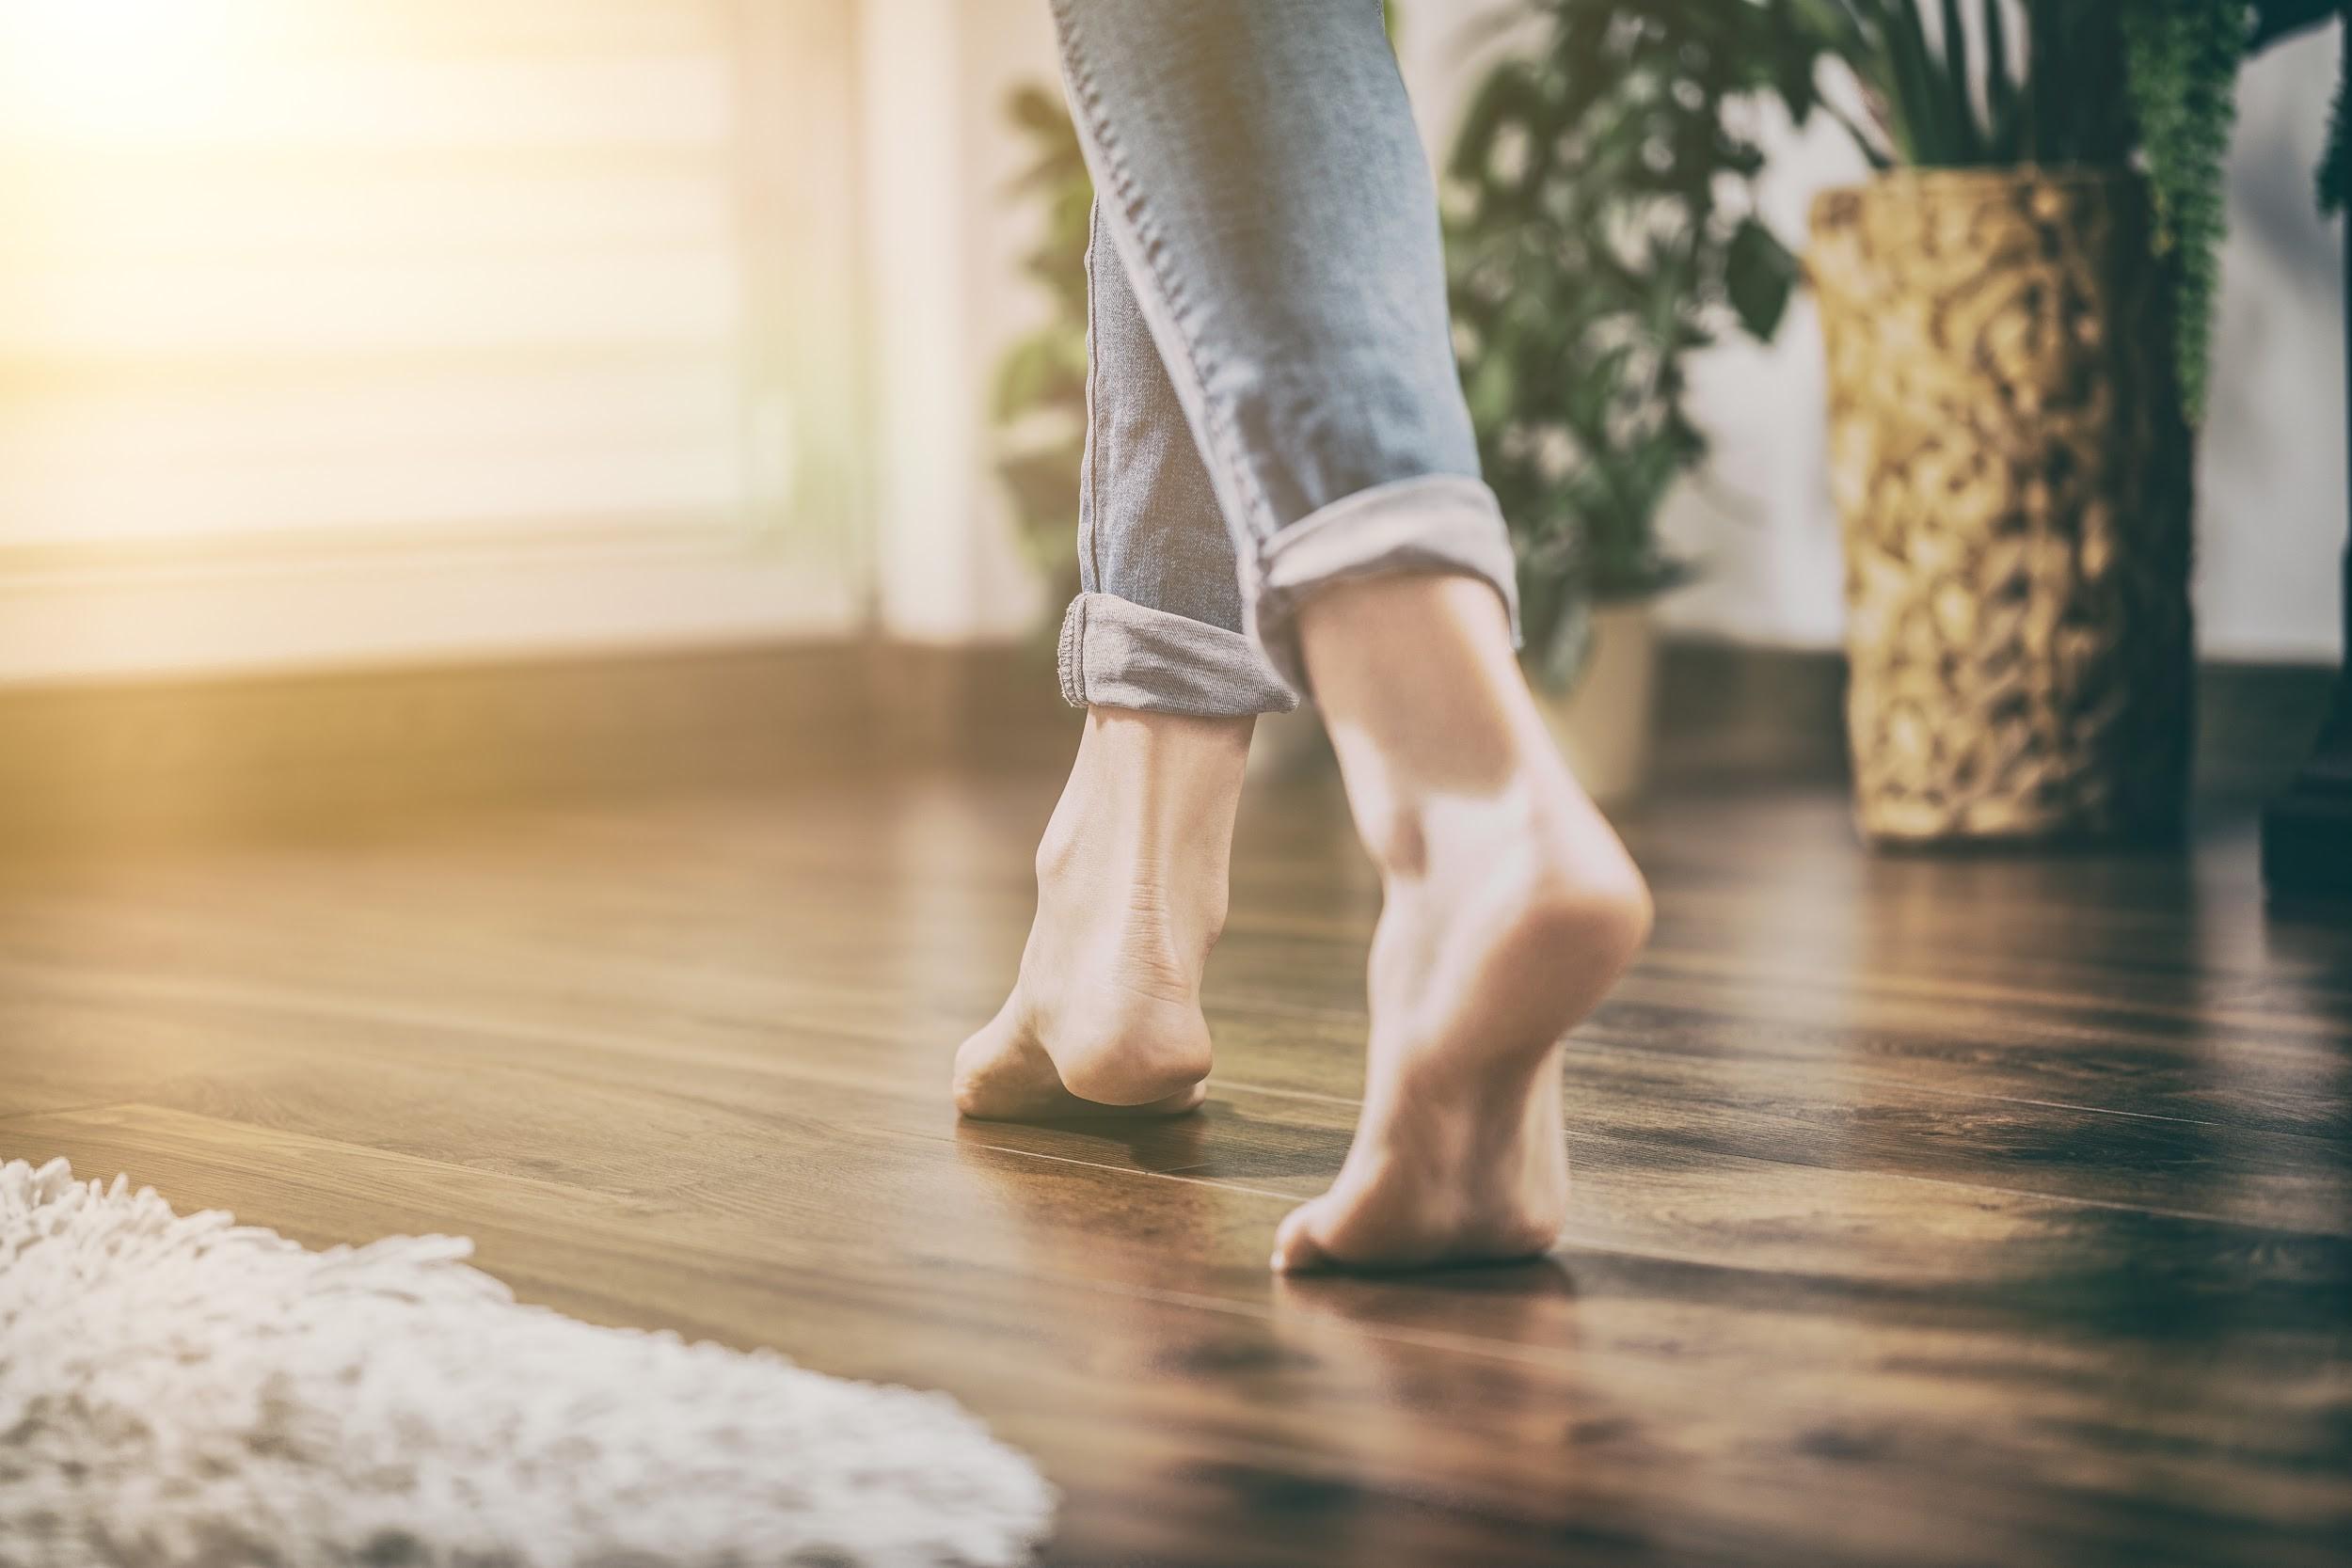 Já pensaste em colocar pavimento radiante elétrico?